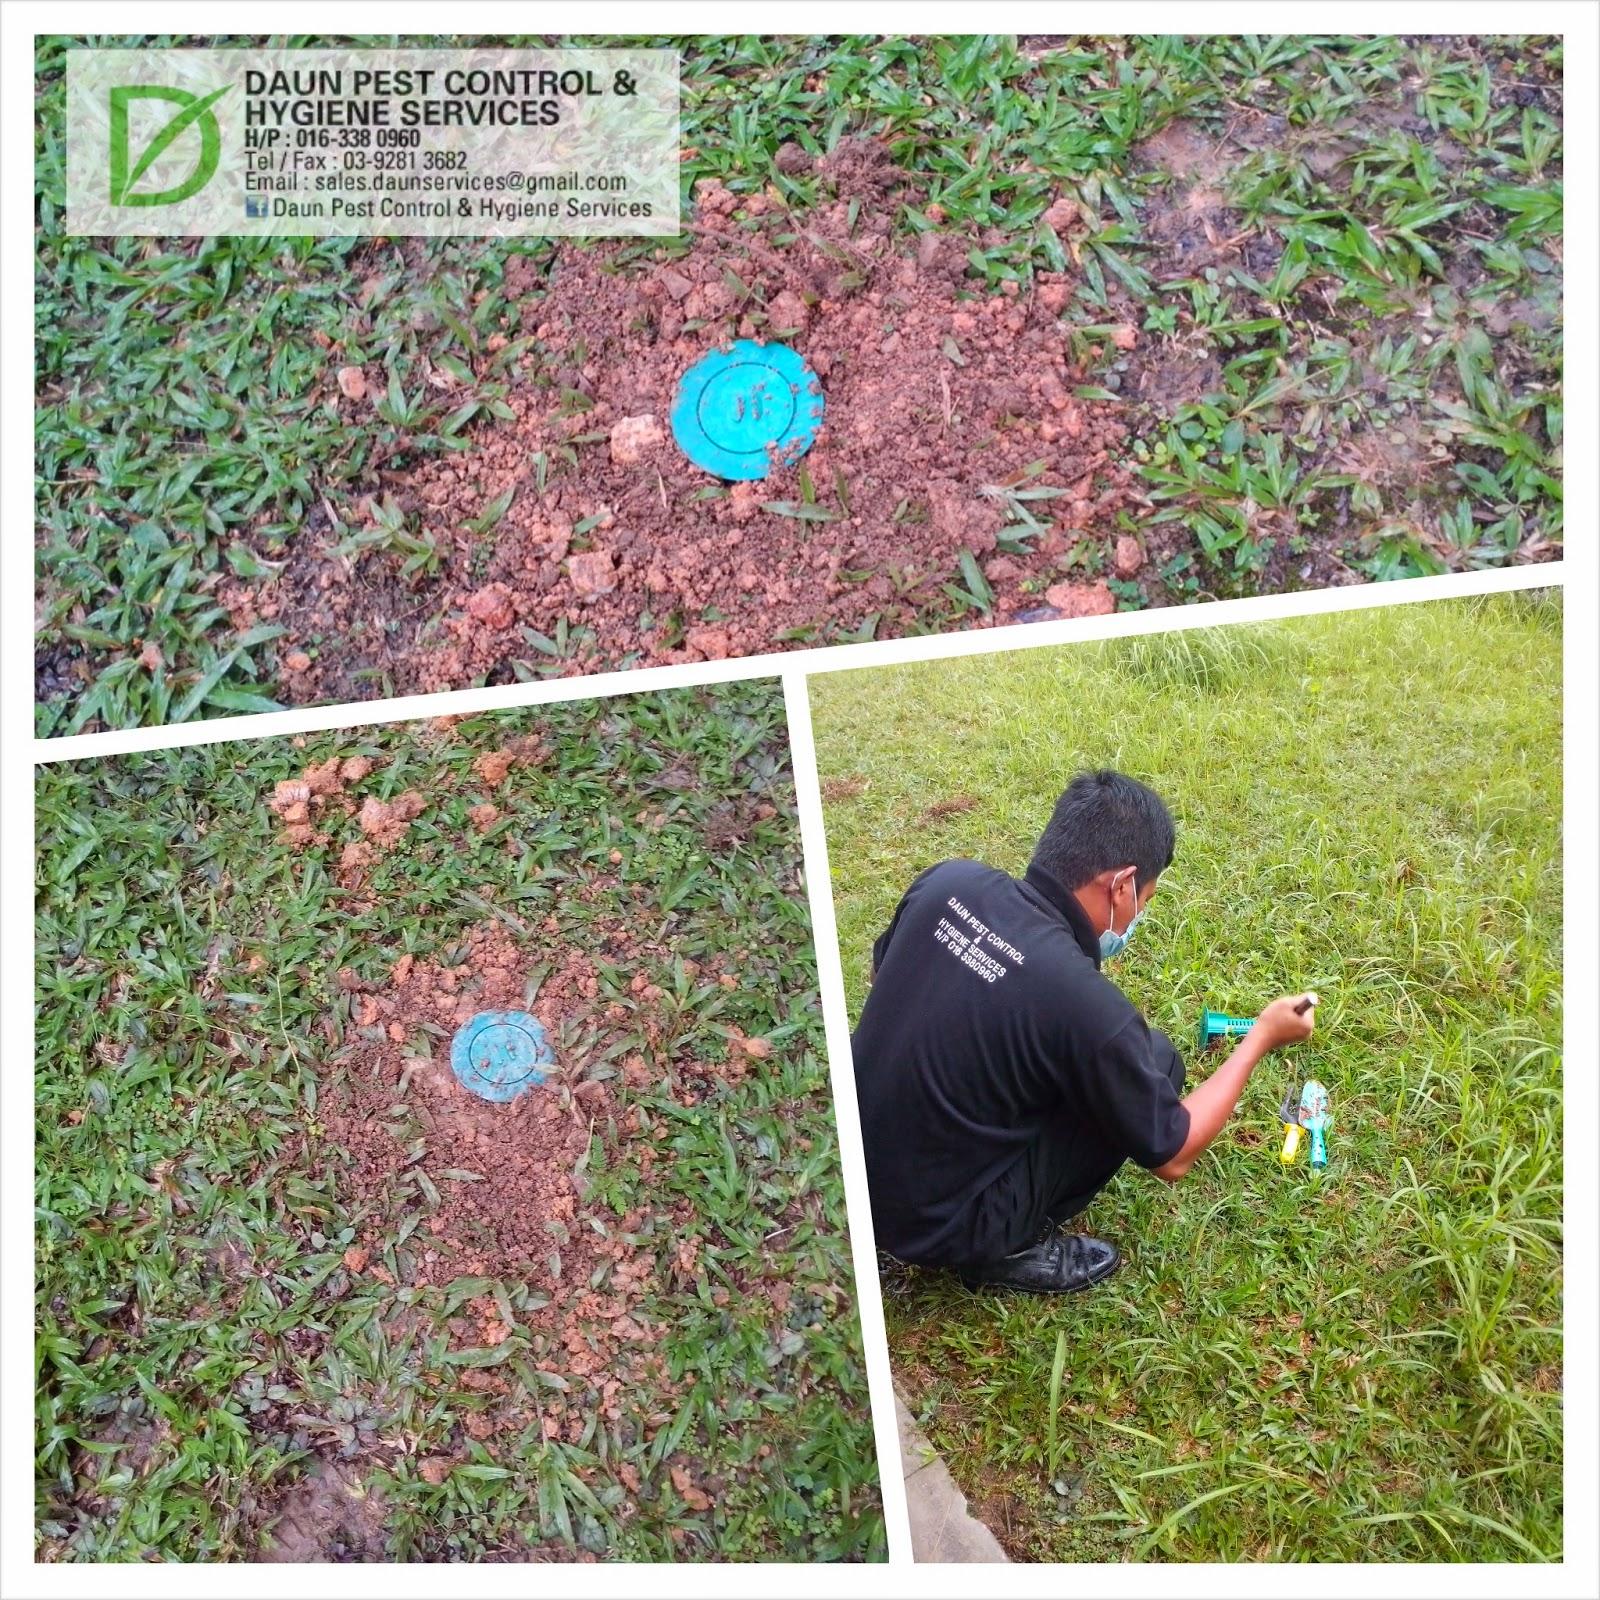 Daun Pest Control And Hygiene Services Termites Baiting